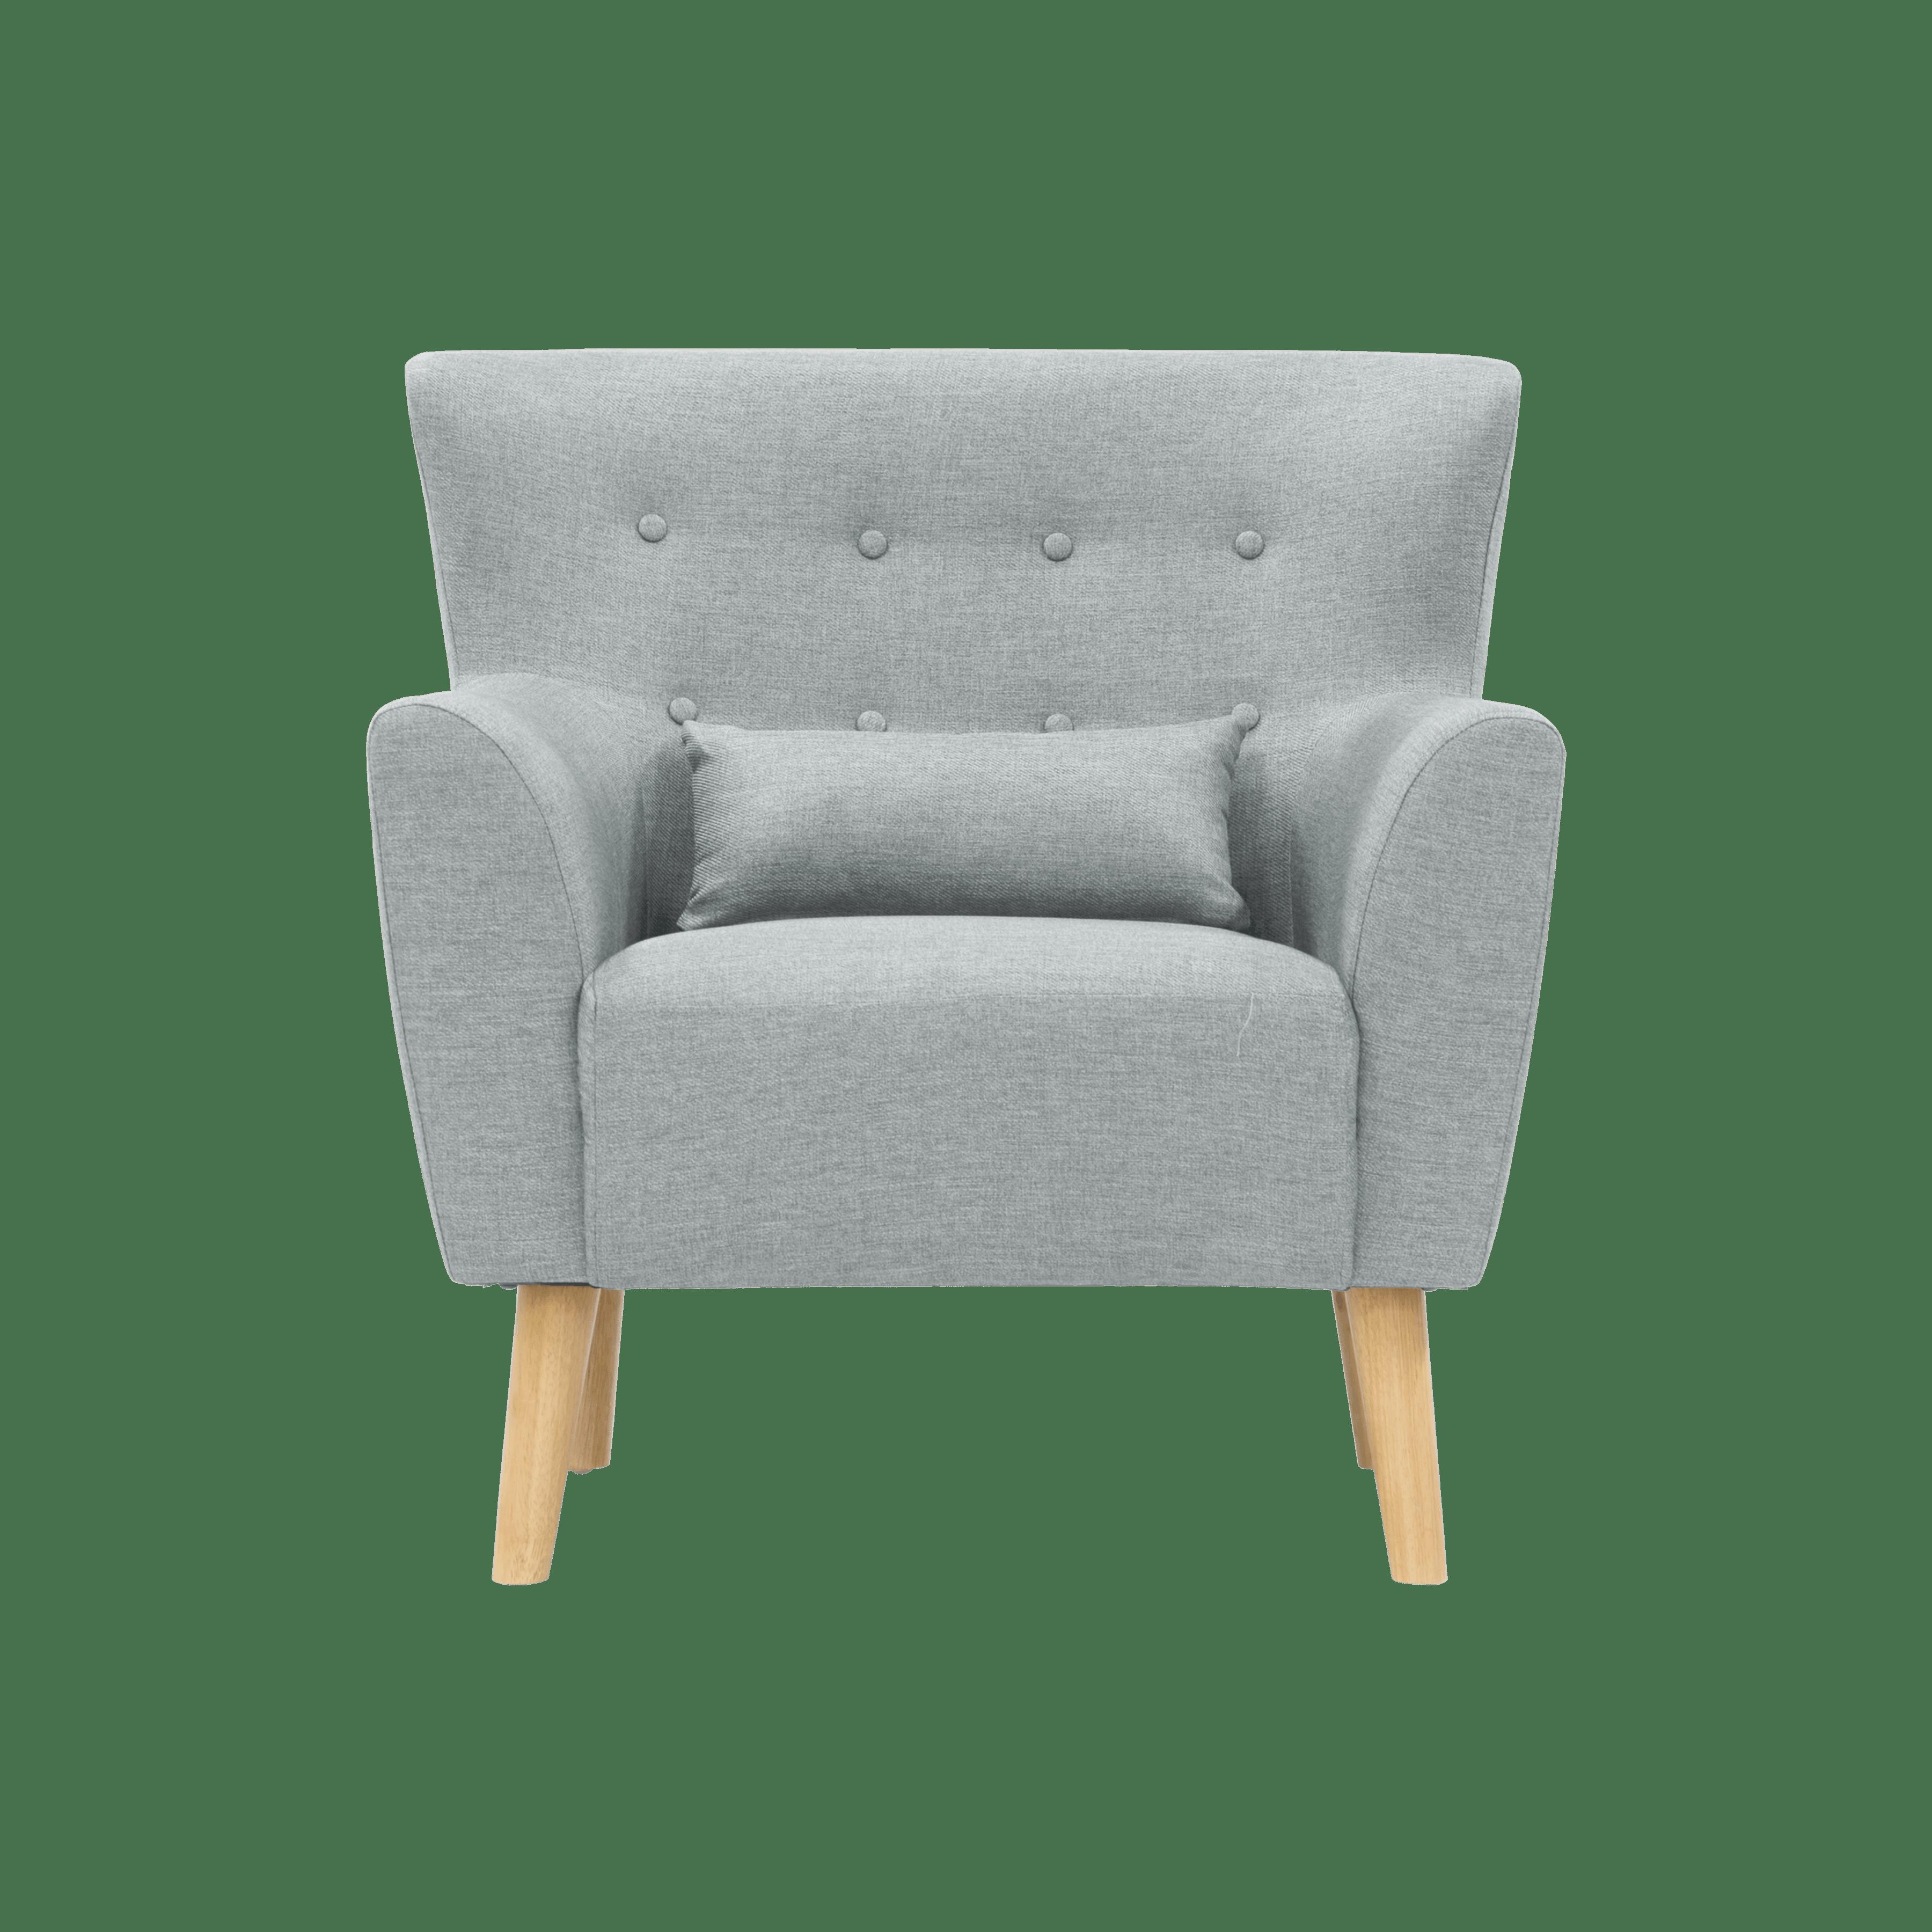 Sofia+armchair+Sofa+Silver.png?fm=jpgq=85w=300